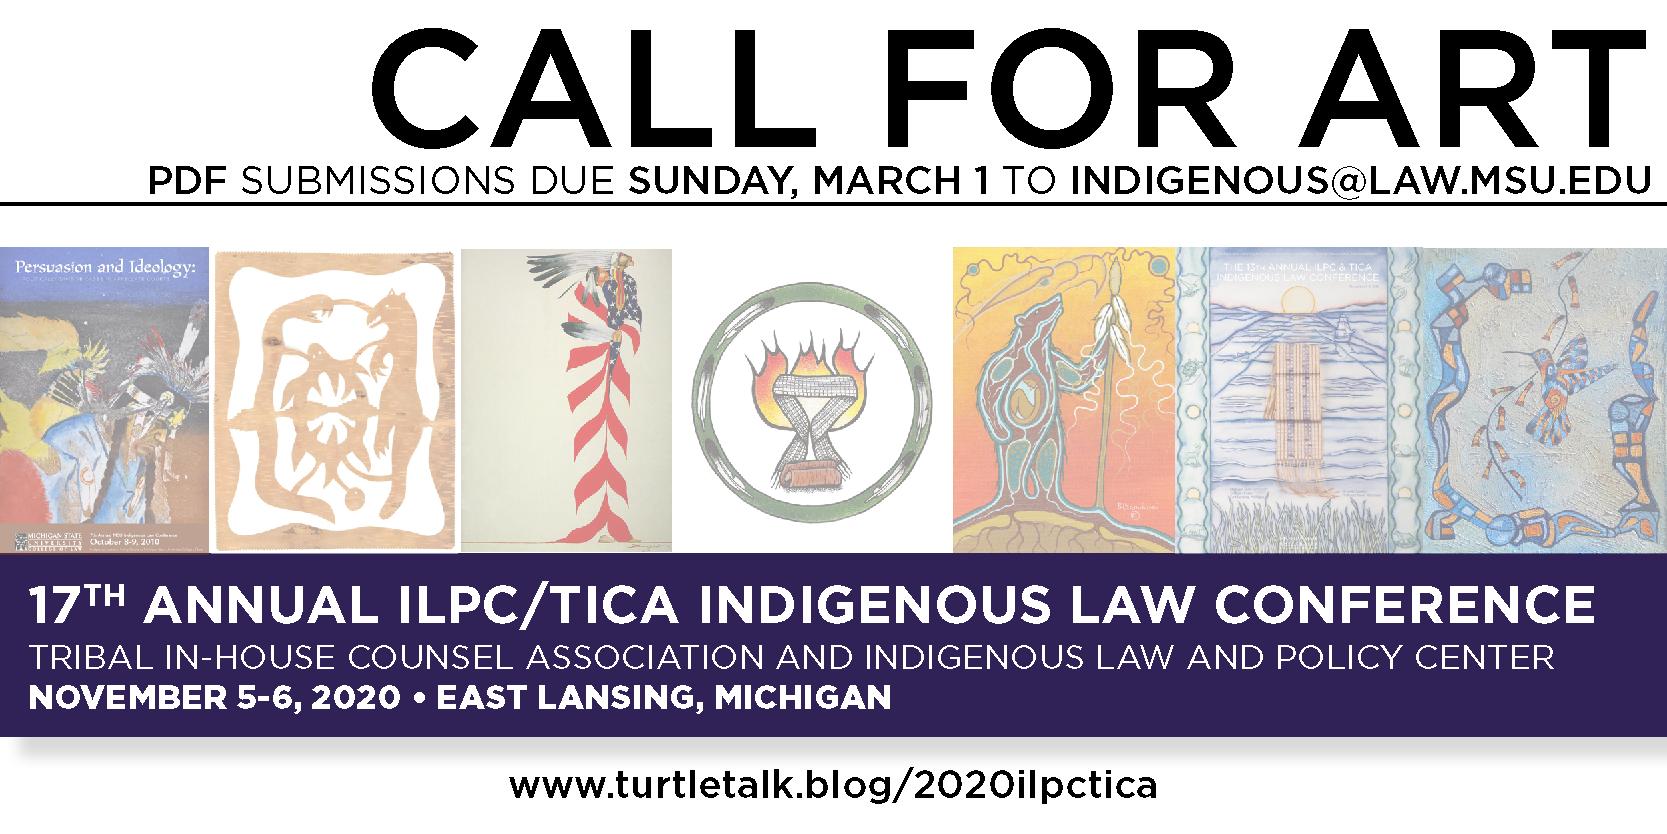 CFP TICA 2020 web banner_03